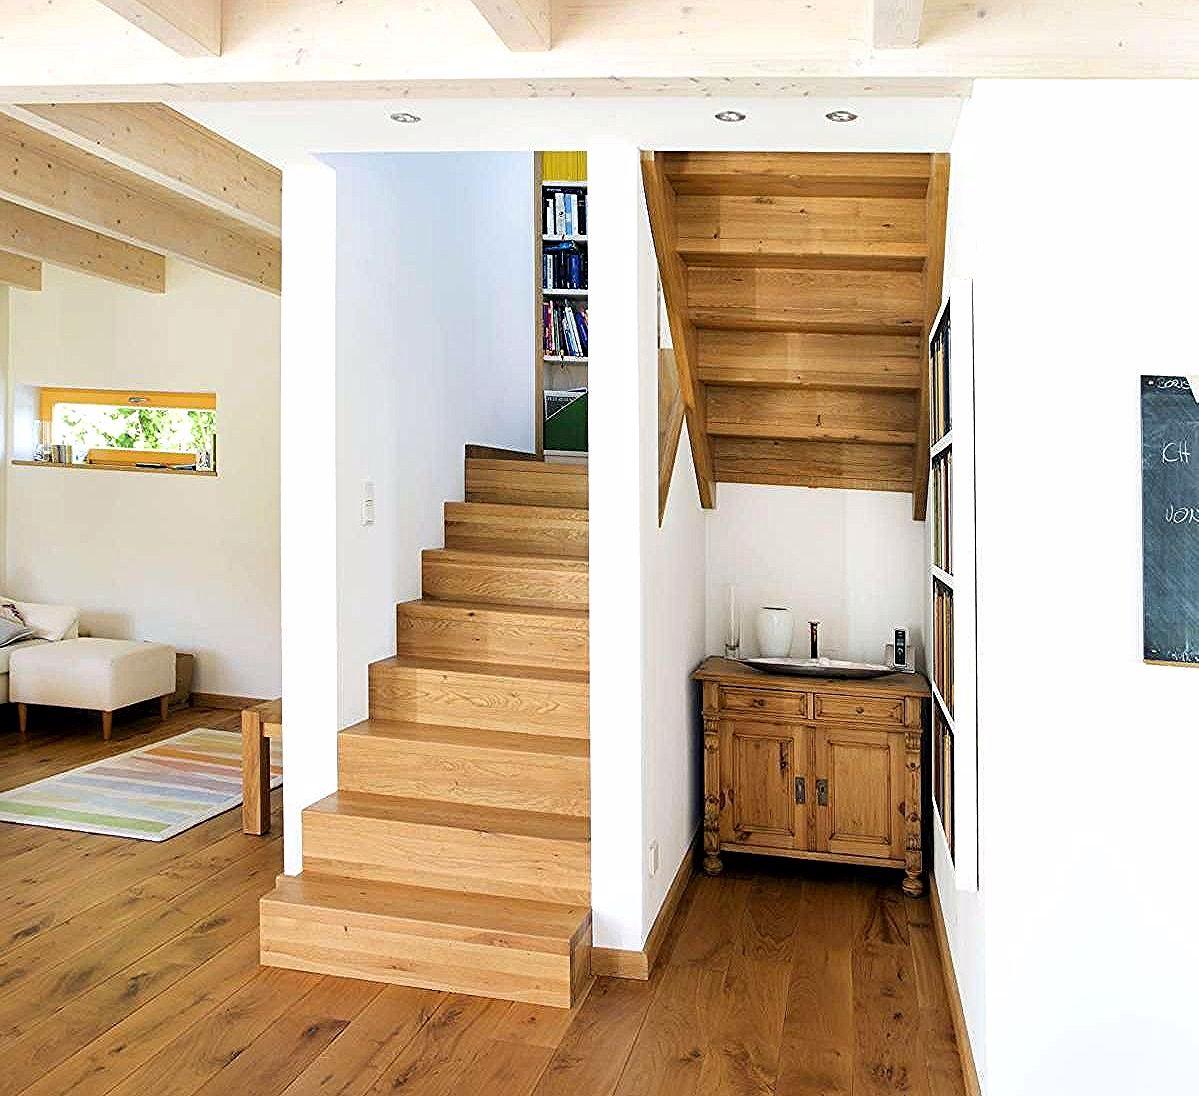 Stepenice In 2020 Podesttreppe Treppe Umbauen Badezimmer Unter Der Treppe